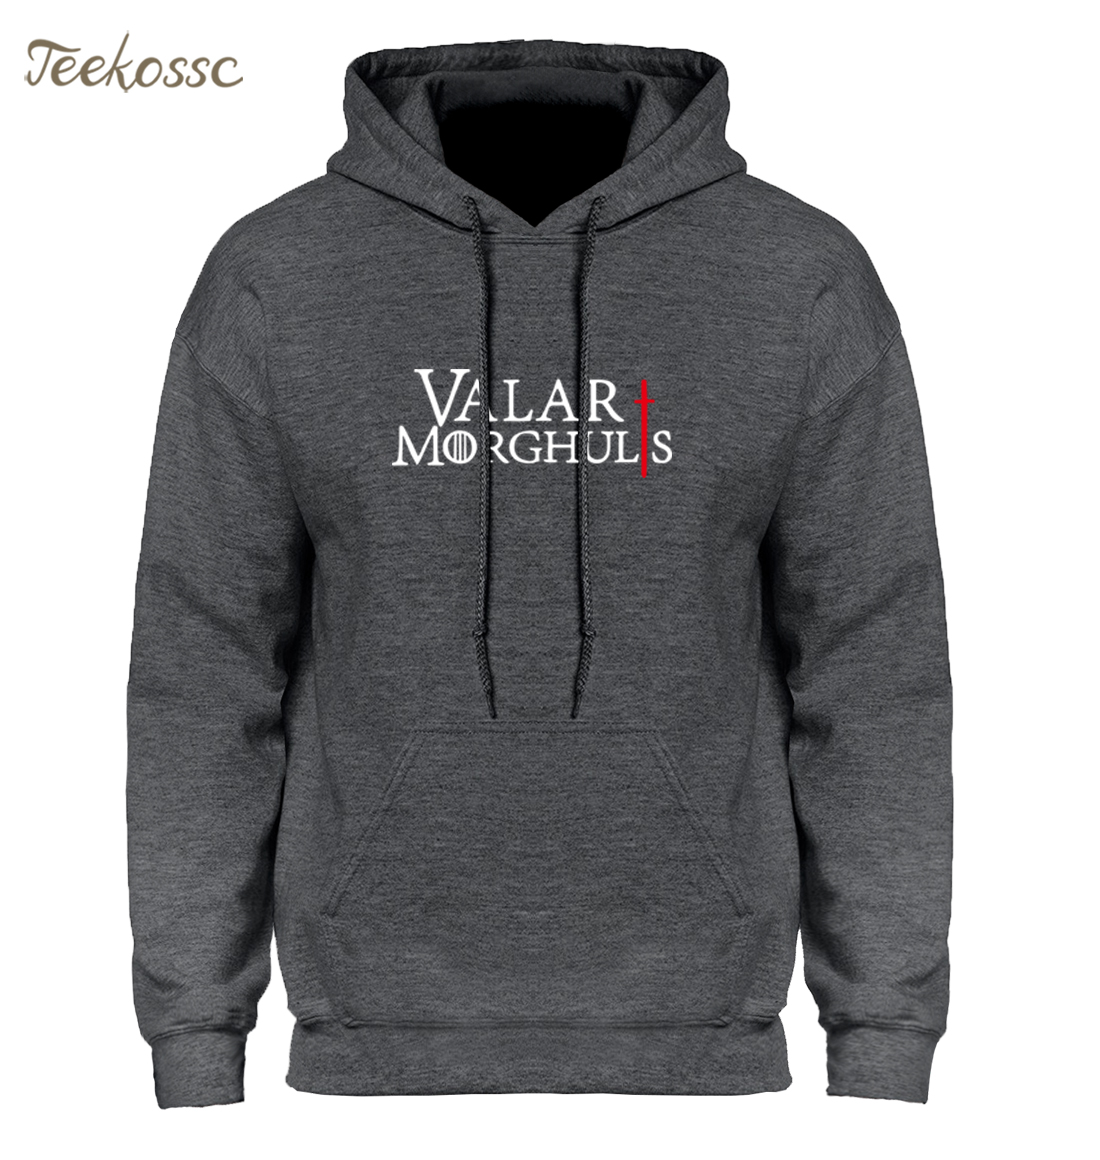 Game Of Thrones Valar Morghulis Hoodie Hoodies Sweatshirt Men 2018 New Fashion Winter Autumn Hooded Hoody Hip Hop Brand Clothing